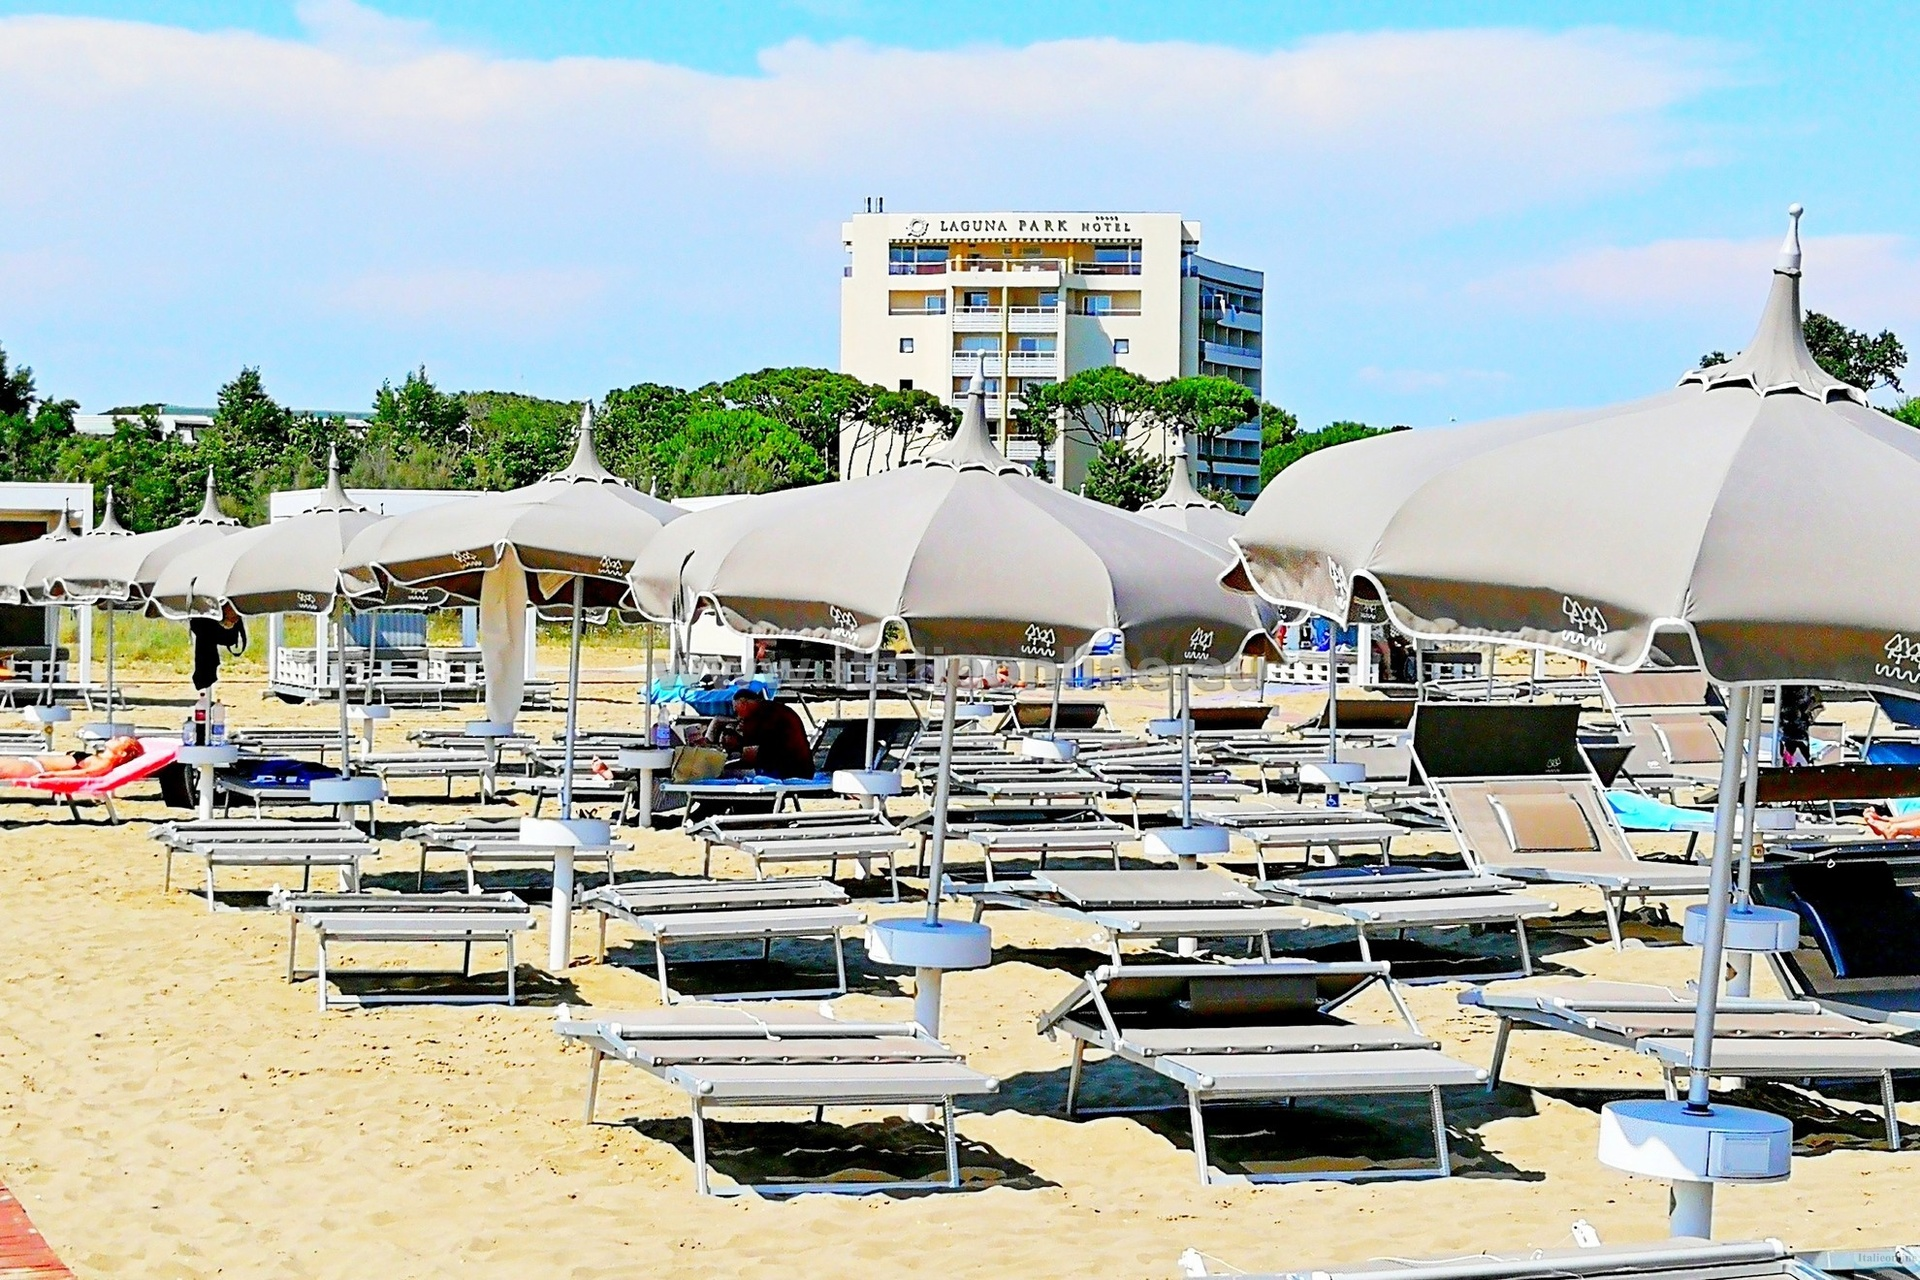 Laguna Park Hotel Bibione Pineda Italien Italieonline  Laguna Park Hot...